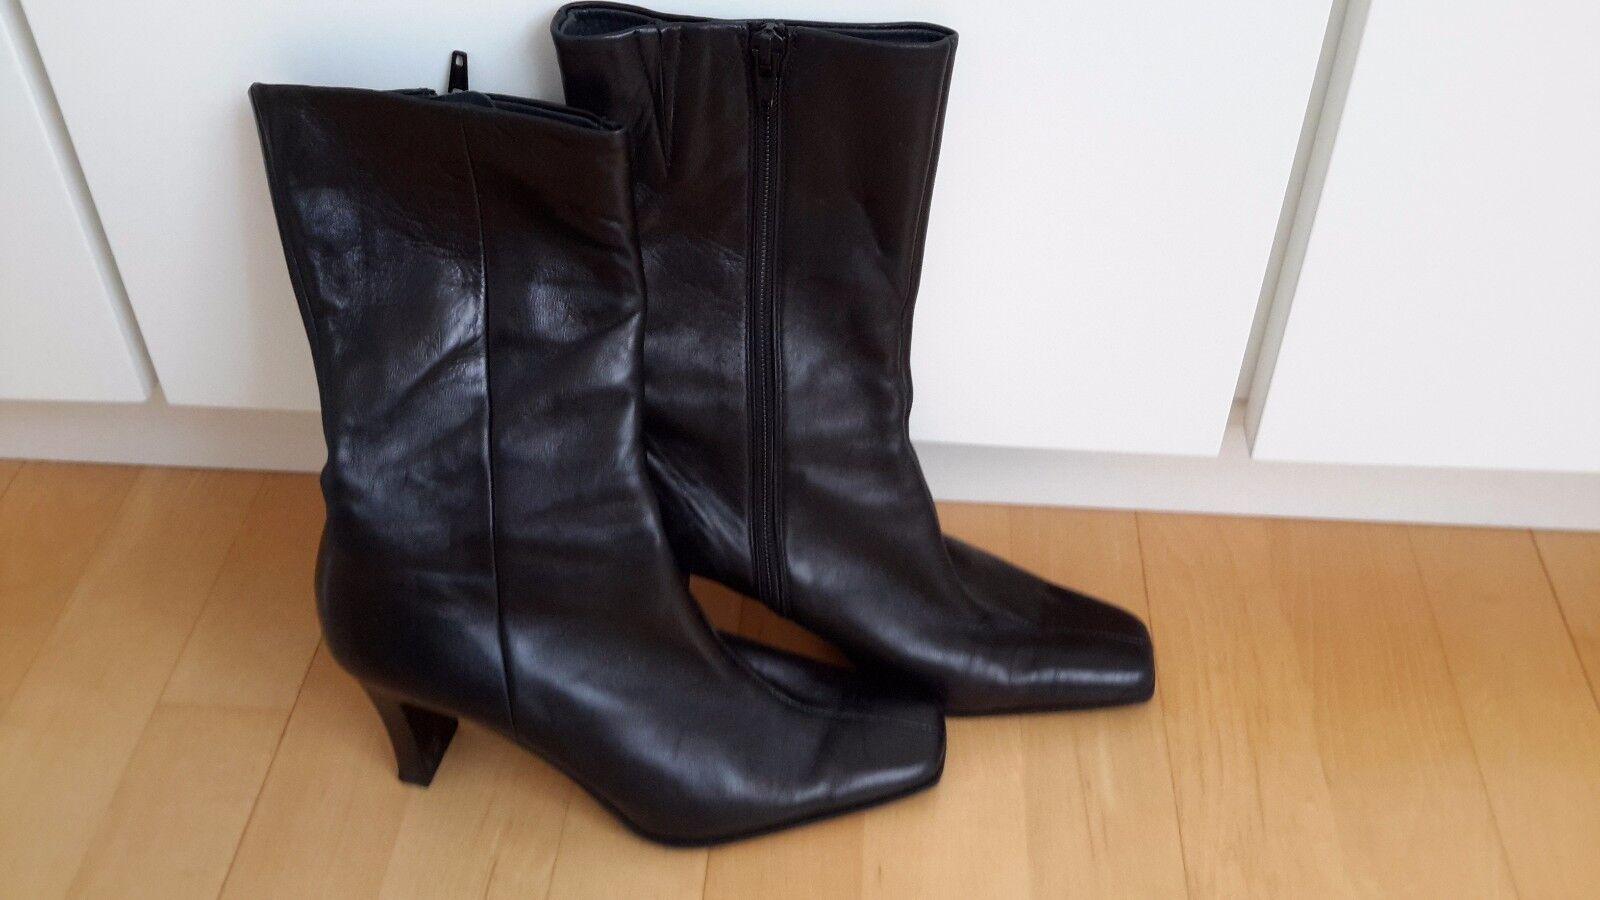 Stiefelette K+S Schuhes 36,5 Damen Gr. 36,5 Schuhes Leder schwarz 92b1ea